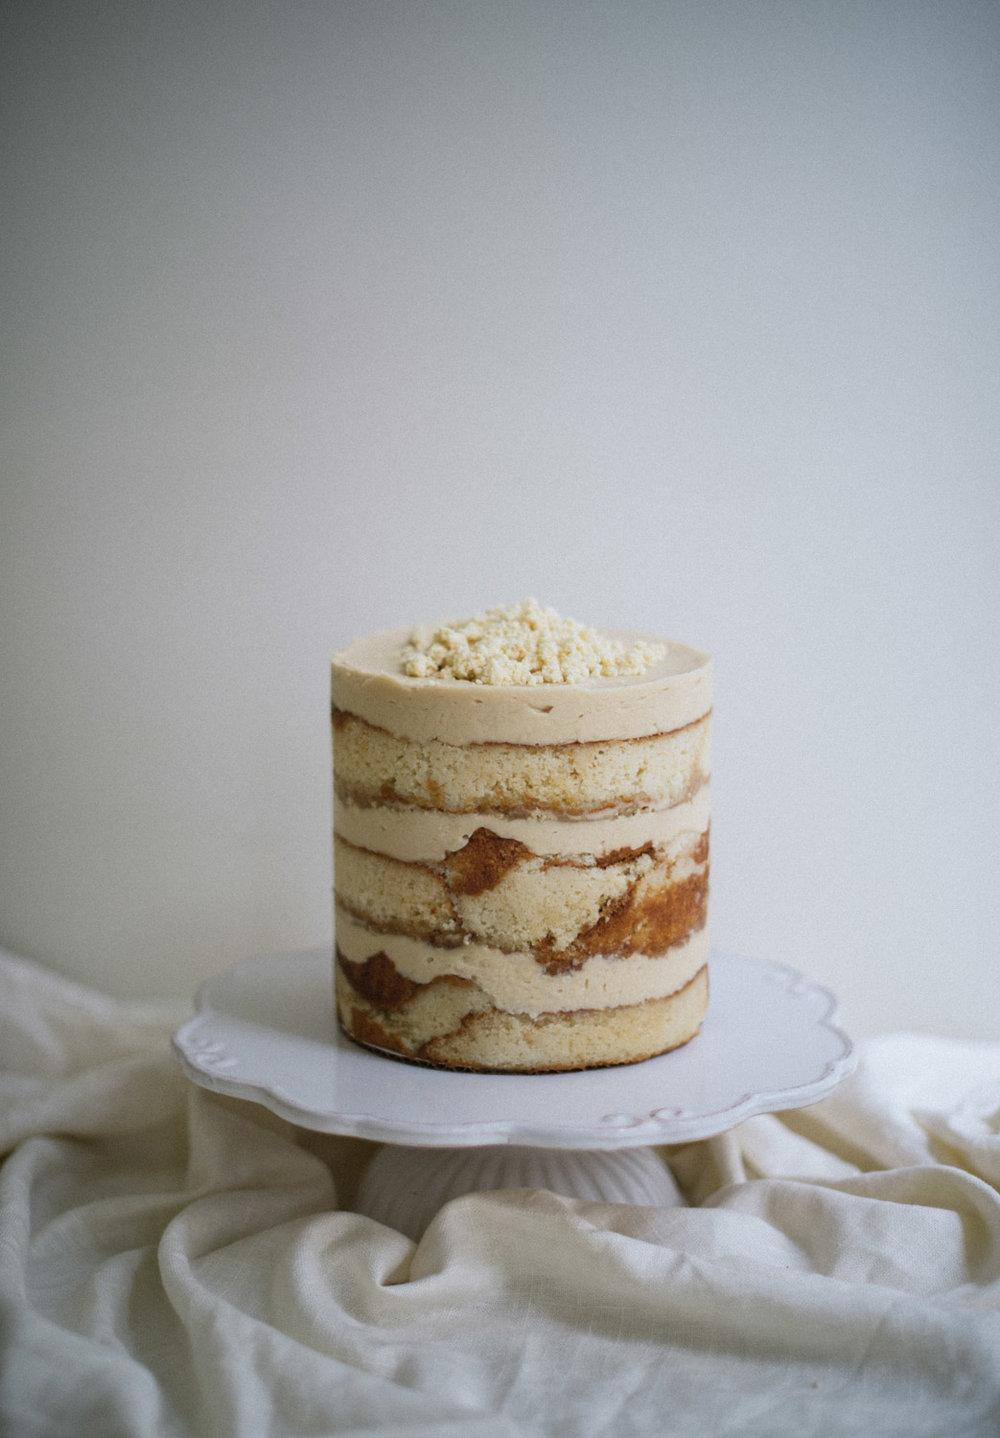 Caramel Layer Cake // caramel cake, caramel buttercream, caramel sauce, and white chocolate milk crumb